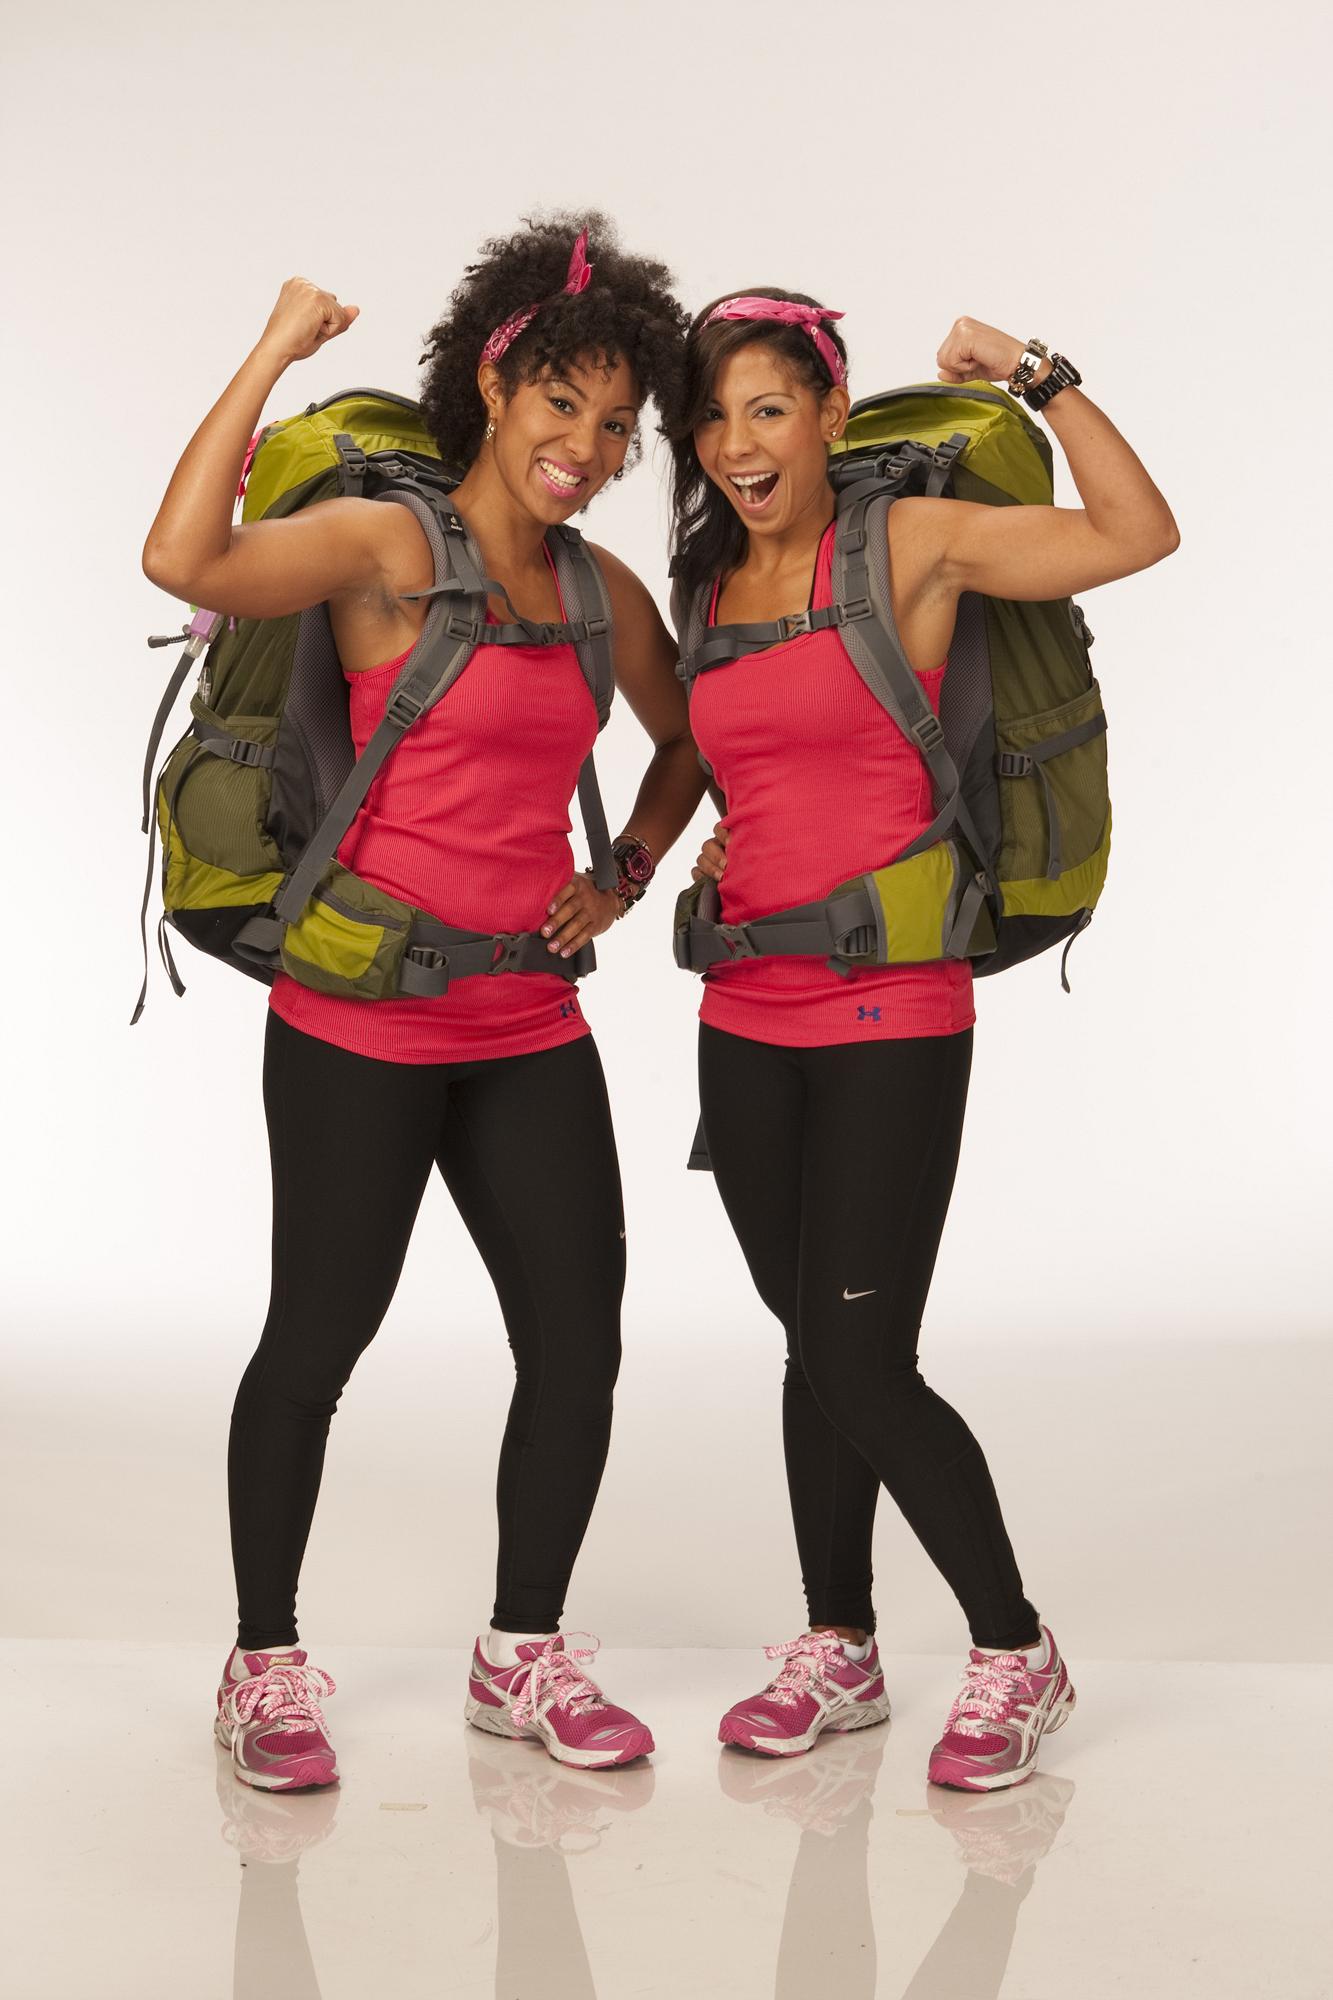 Kerri and Stacy